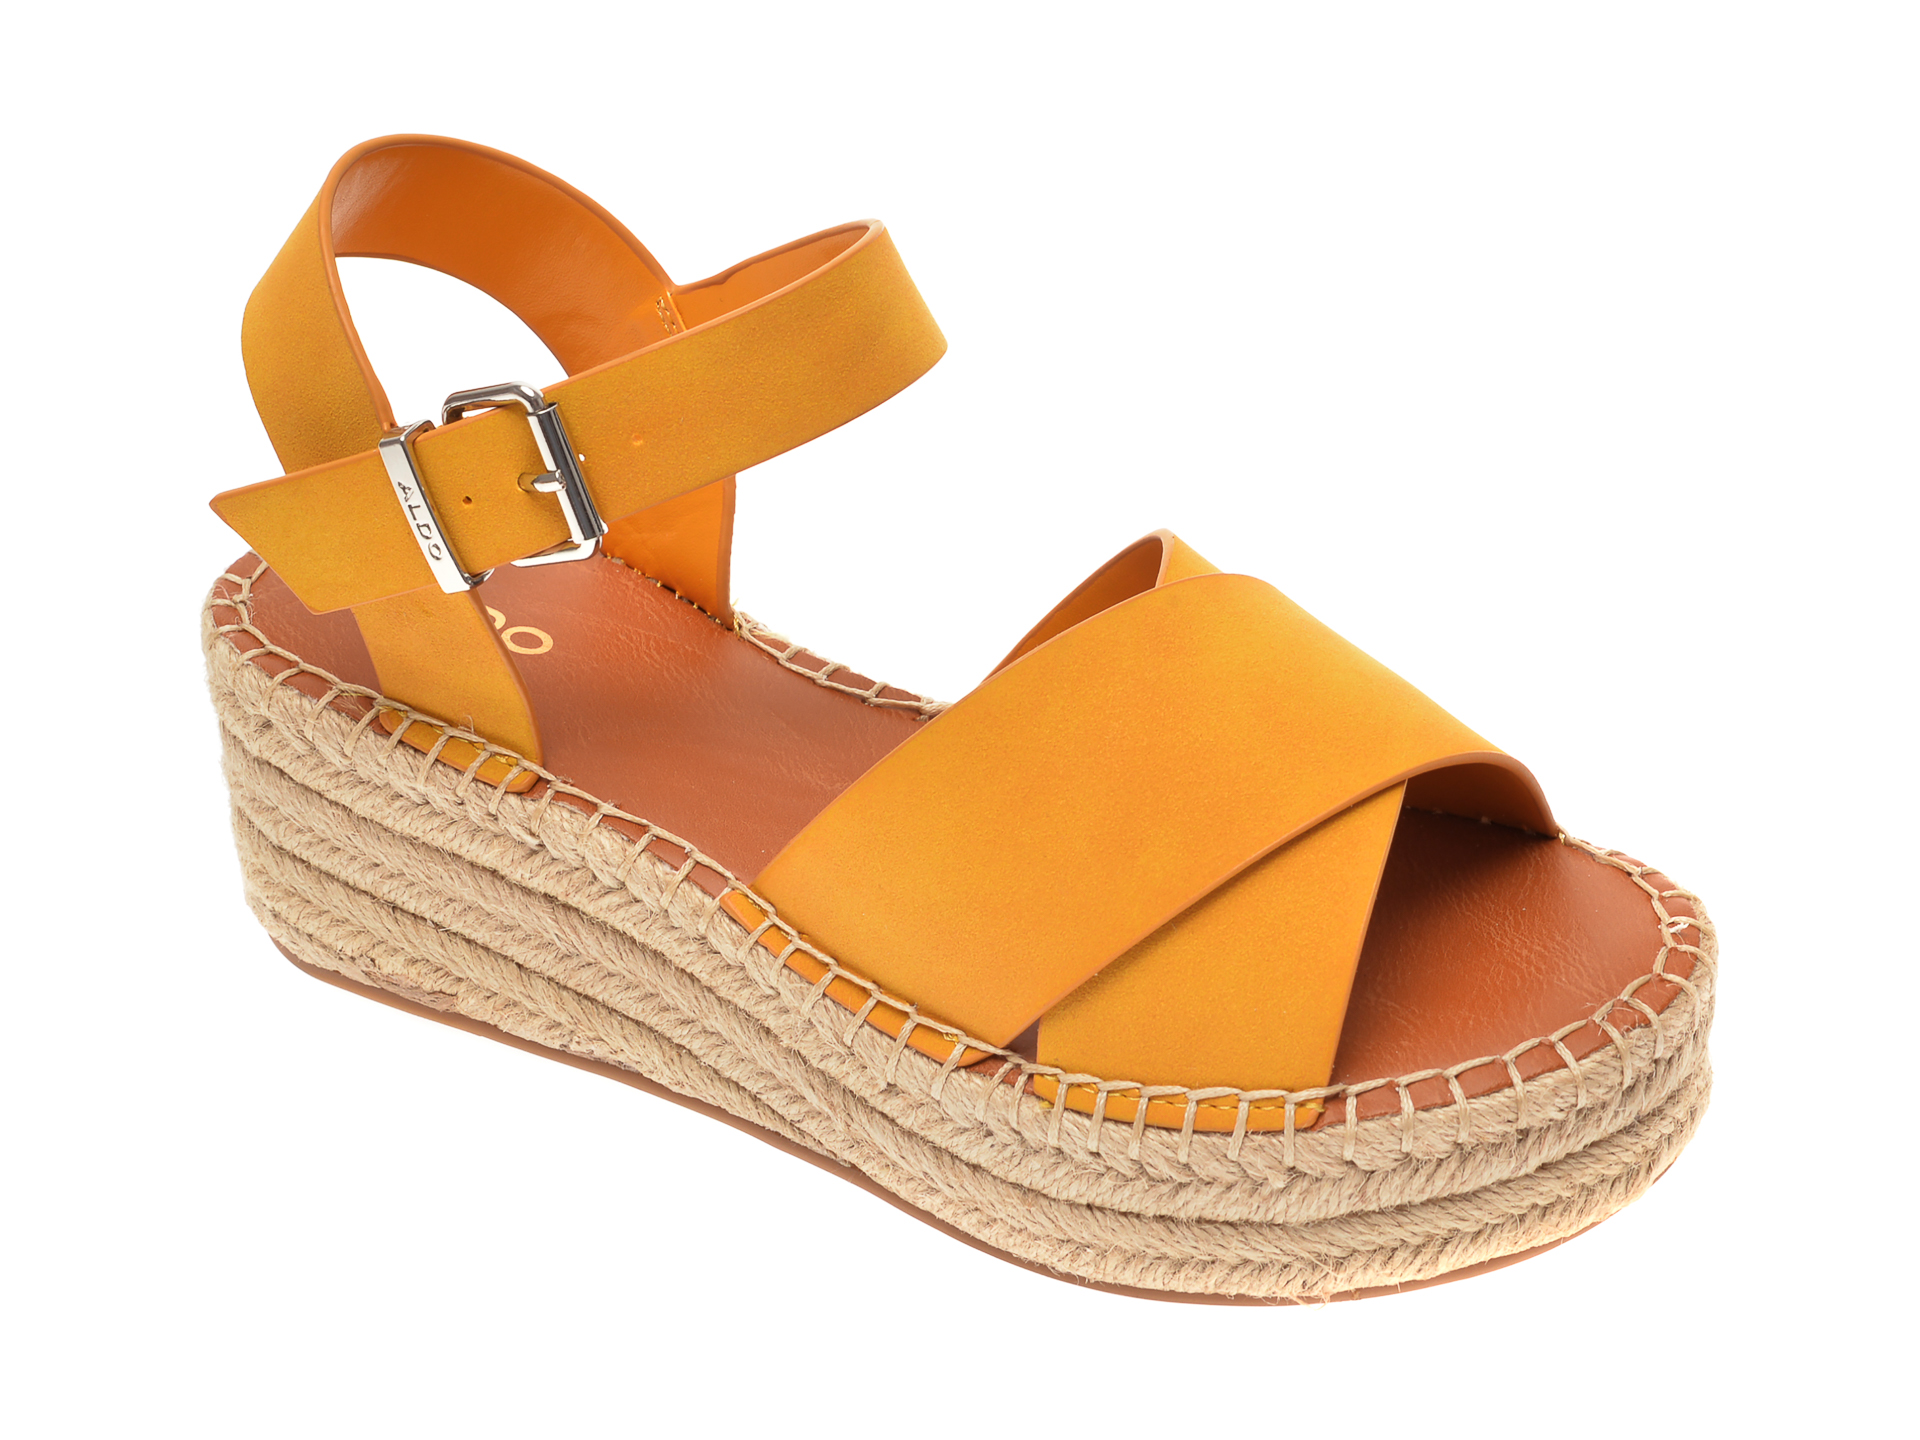 Sandale ALDO galbene, Tineviel700, din piele ecologica imagine